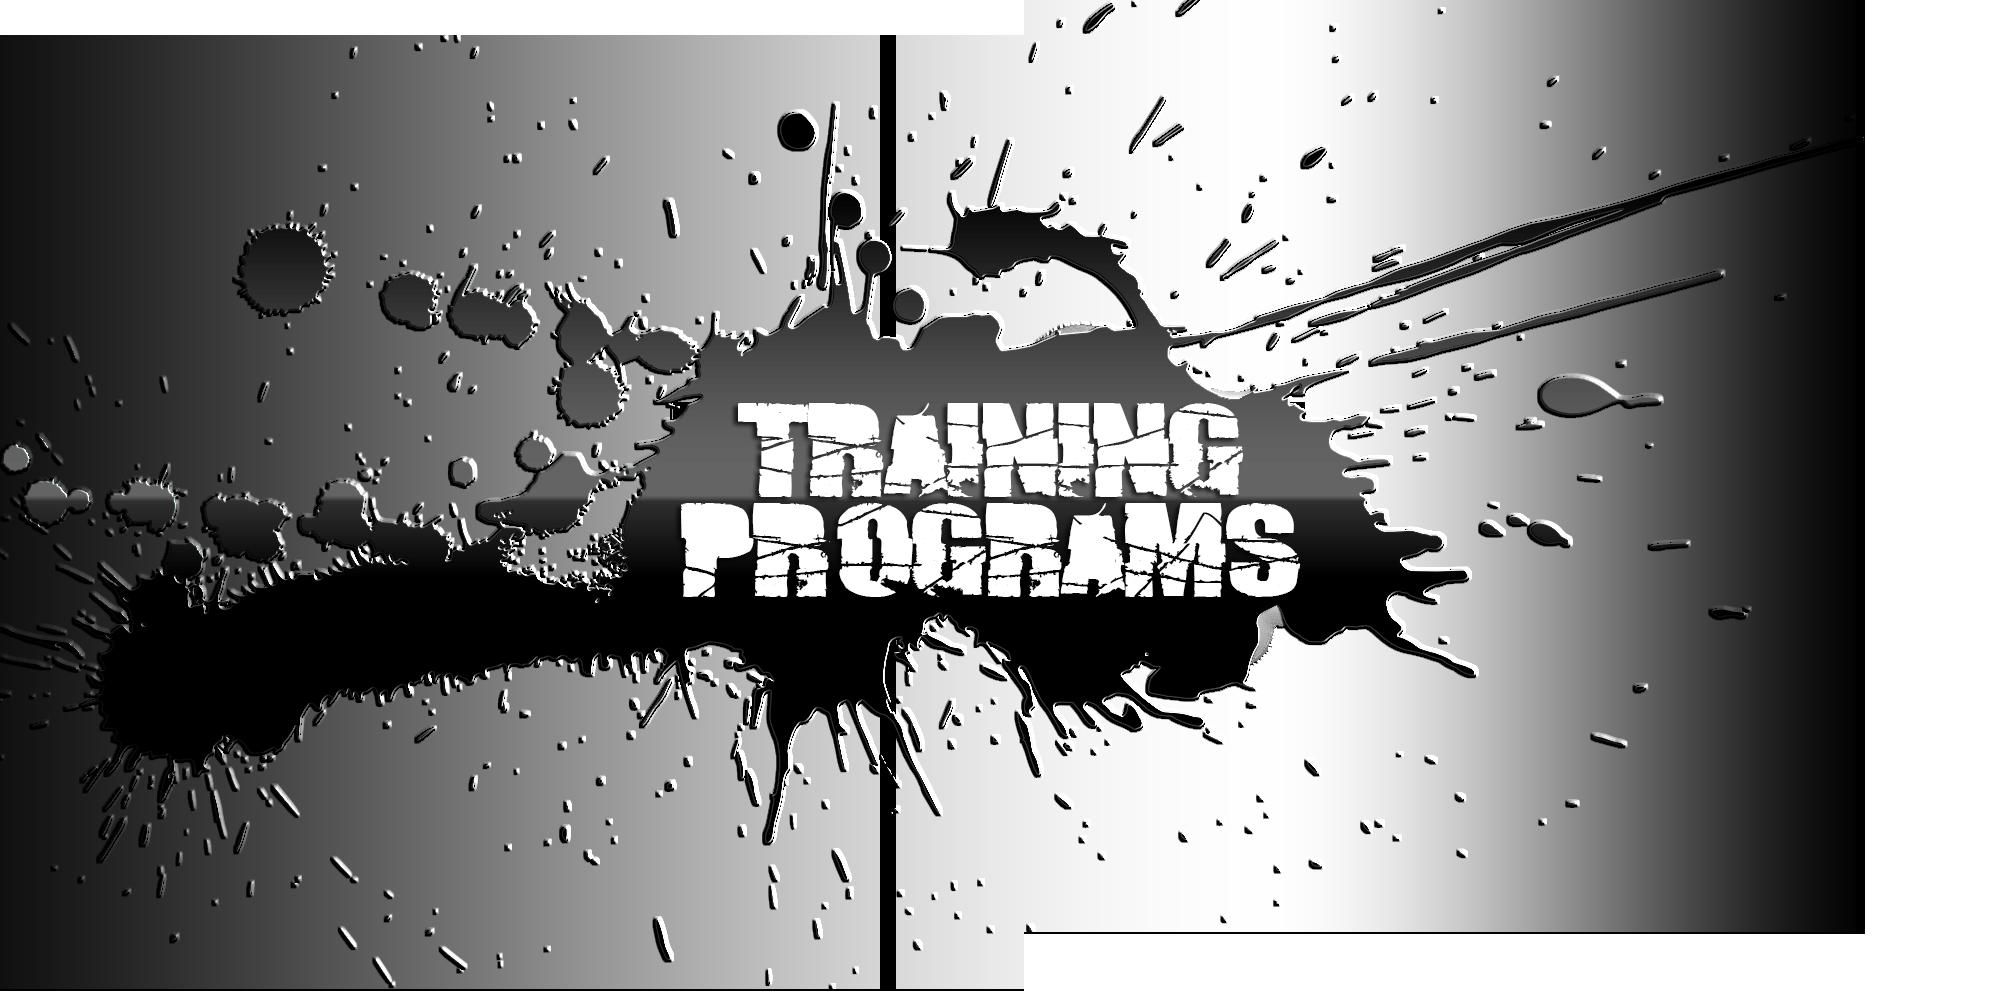 Movement Redefined - Training Programs Splash.png